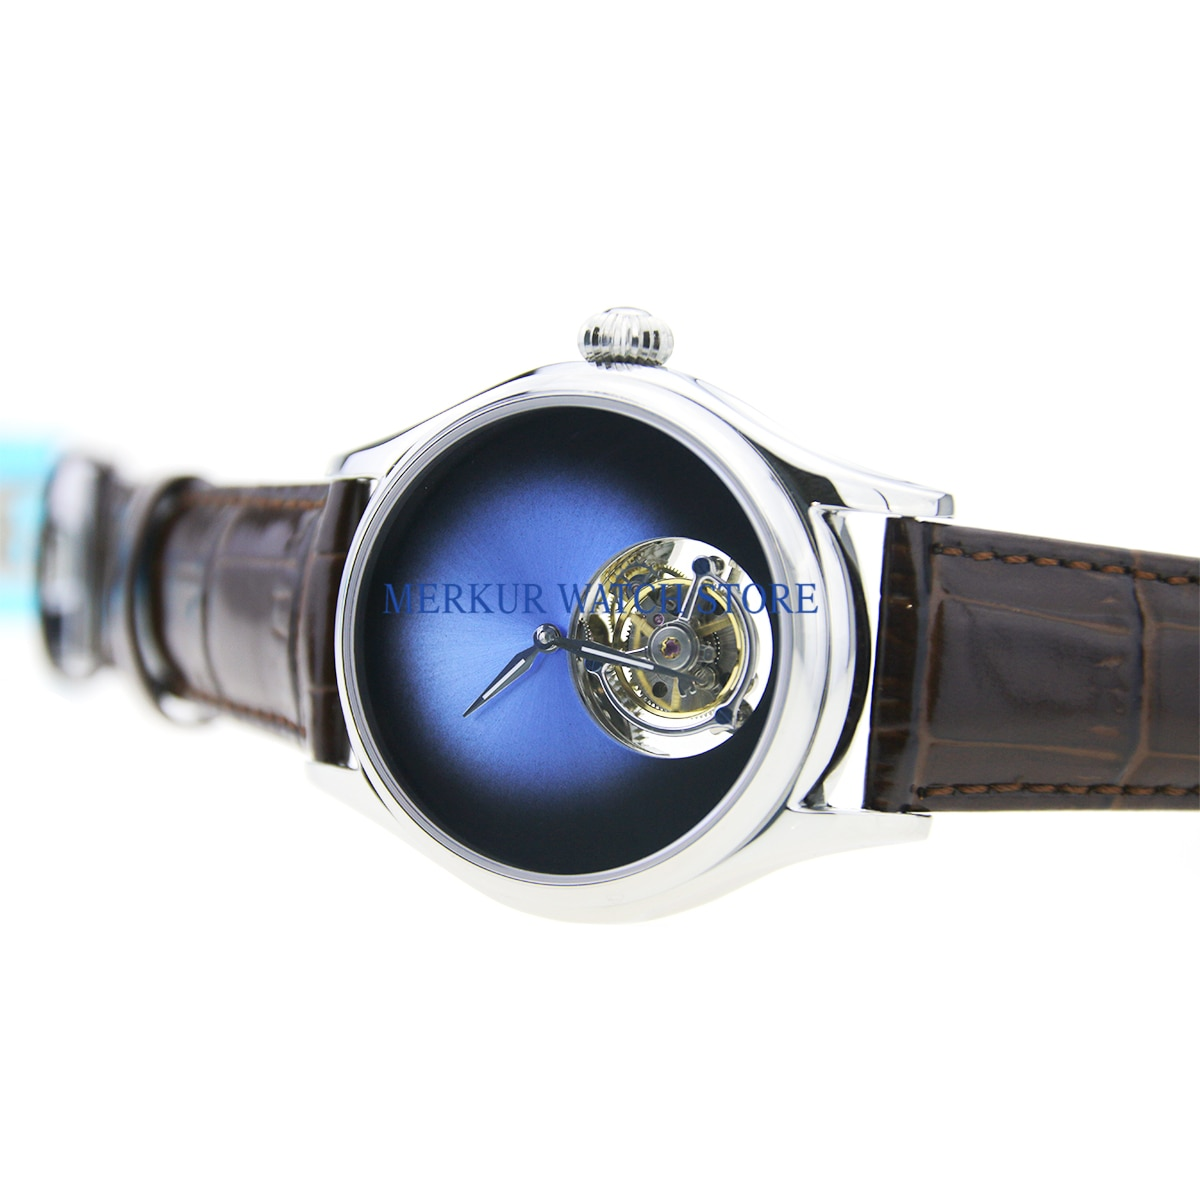 Merkur رجالي ساعة ميكانيكية هانغتشو عالية فاز توربيون حركة الهيكل العظمي فستان فاخر مطلية بالذهب الأسود الهاتفي